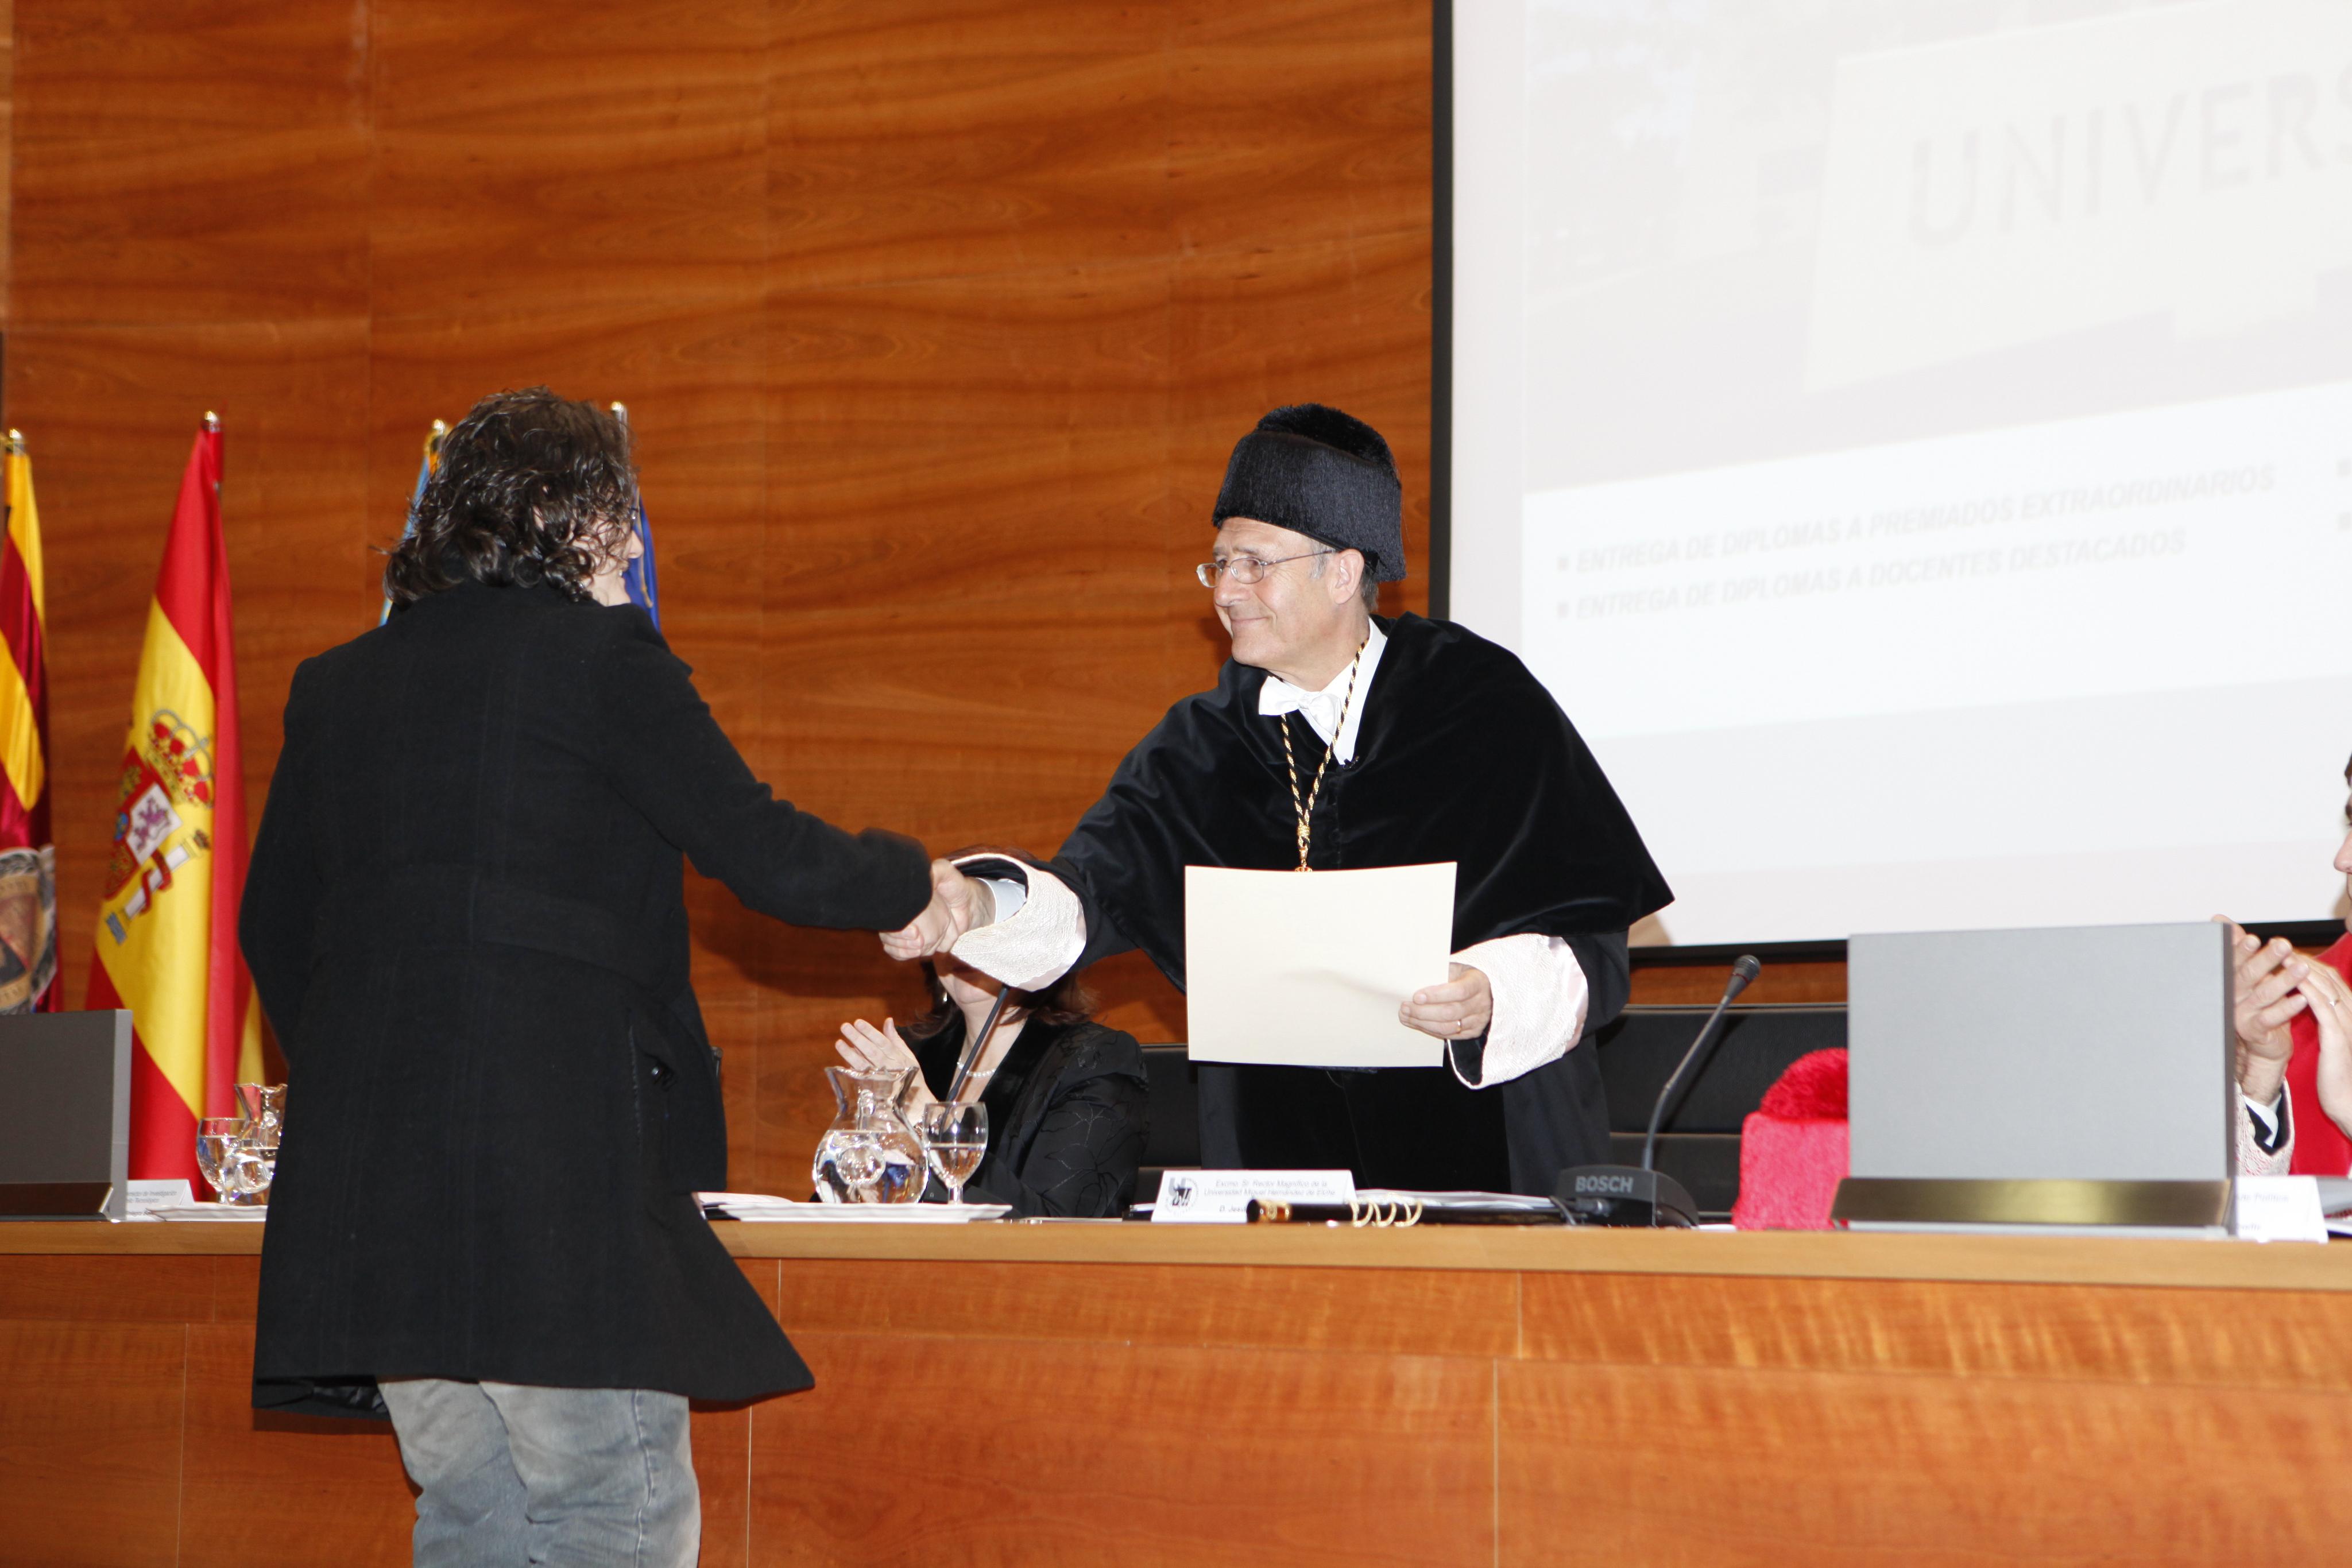 Entrega Diplomas_mg_5120.jpg